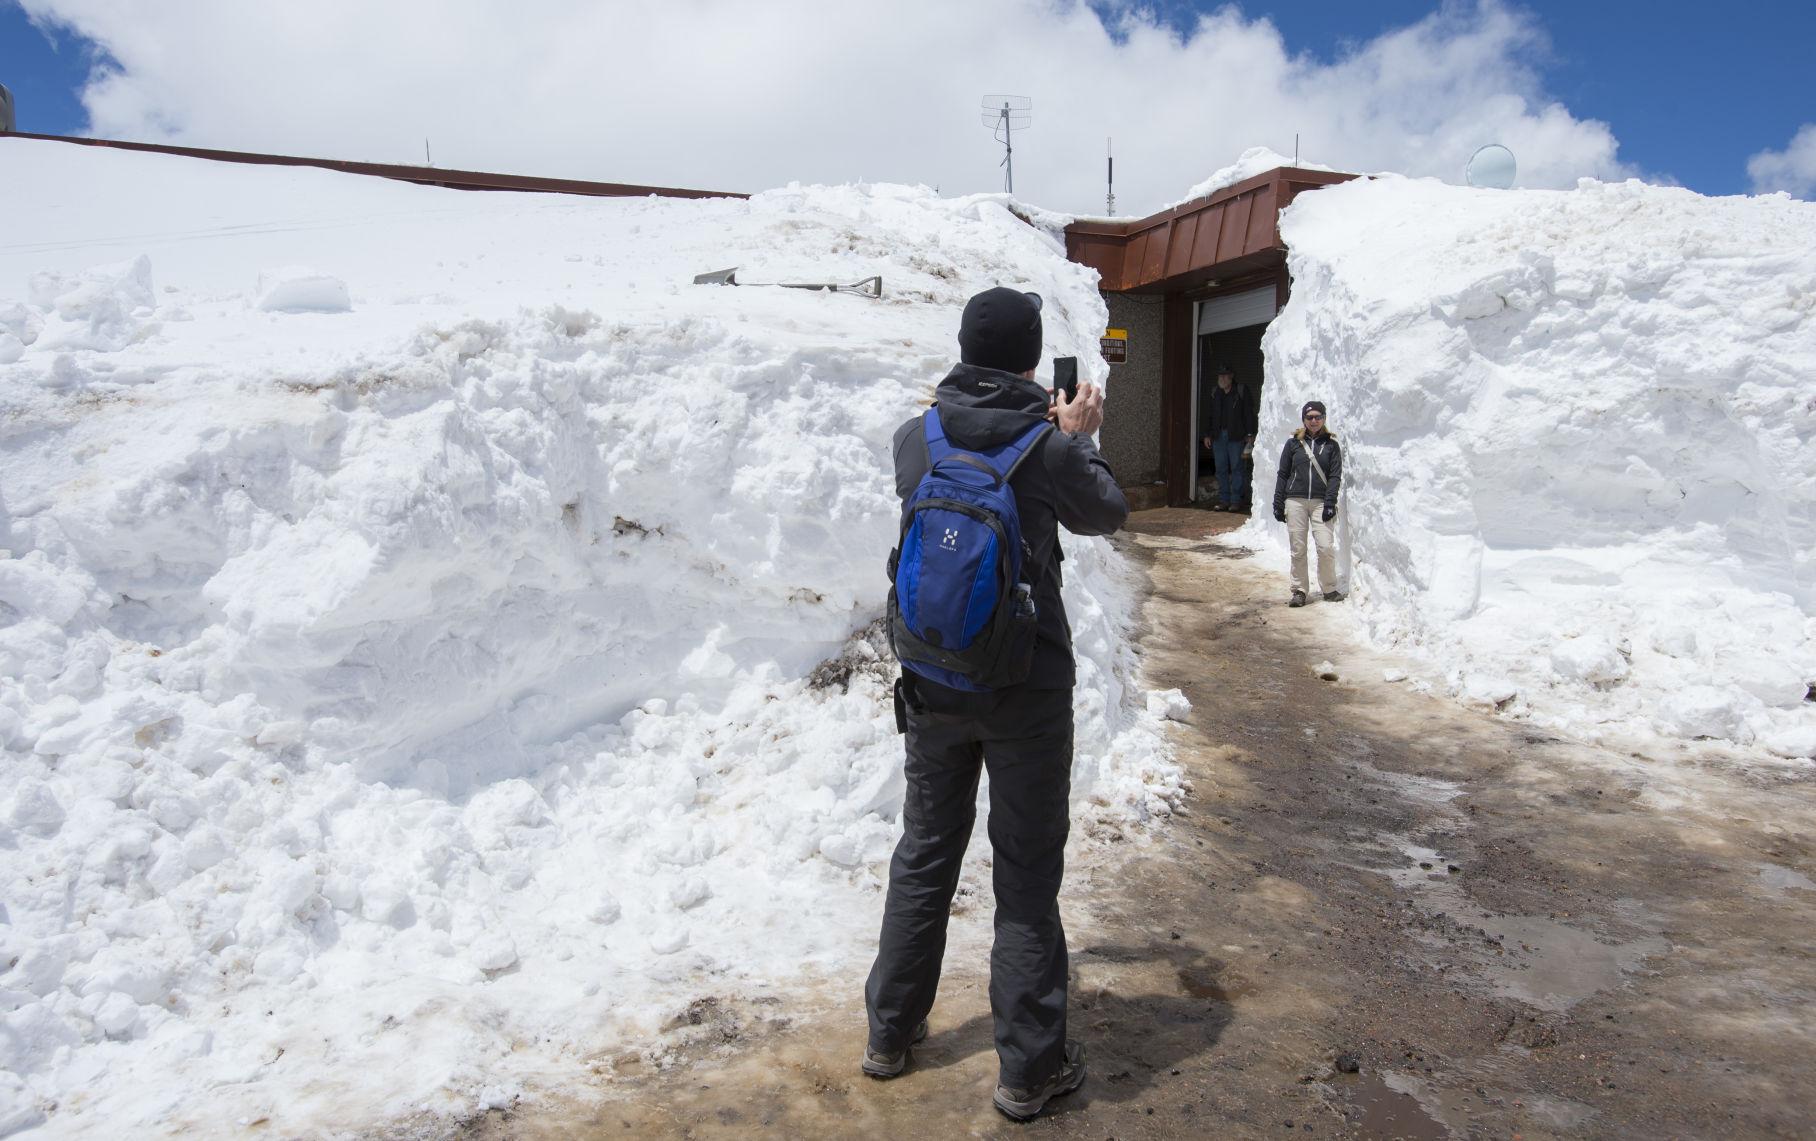 wintry month still wreaking havoc on colorado s high mountain roads rh gazette com